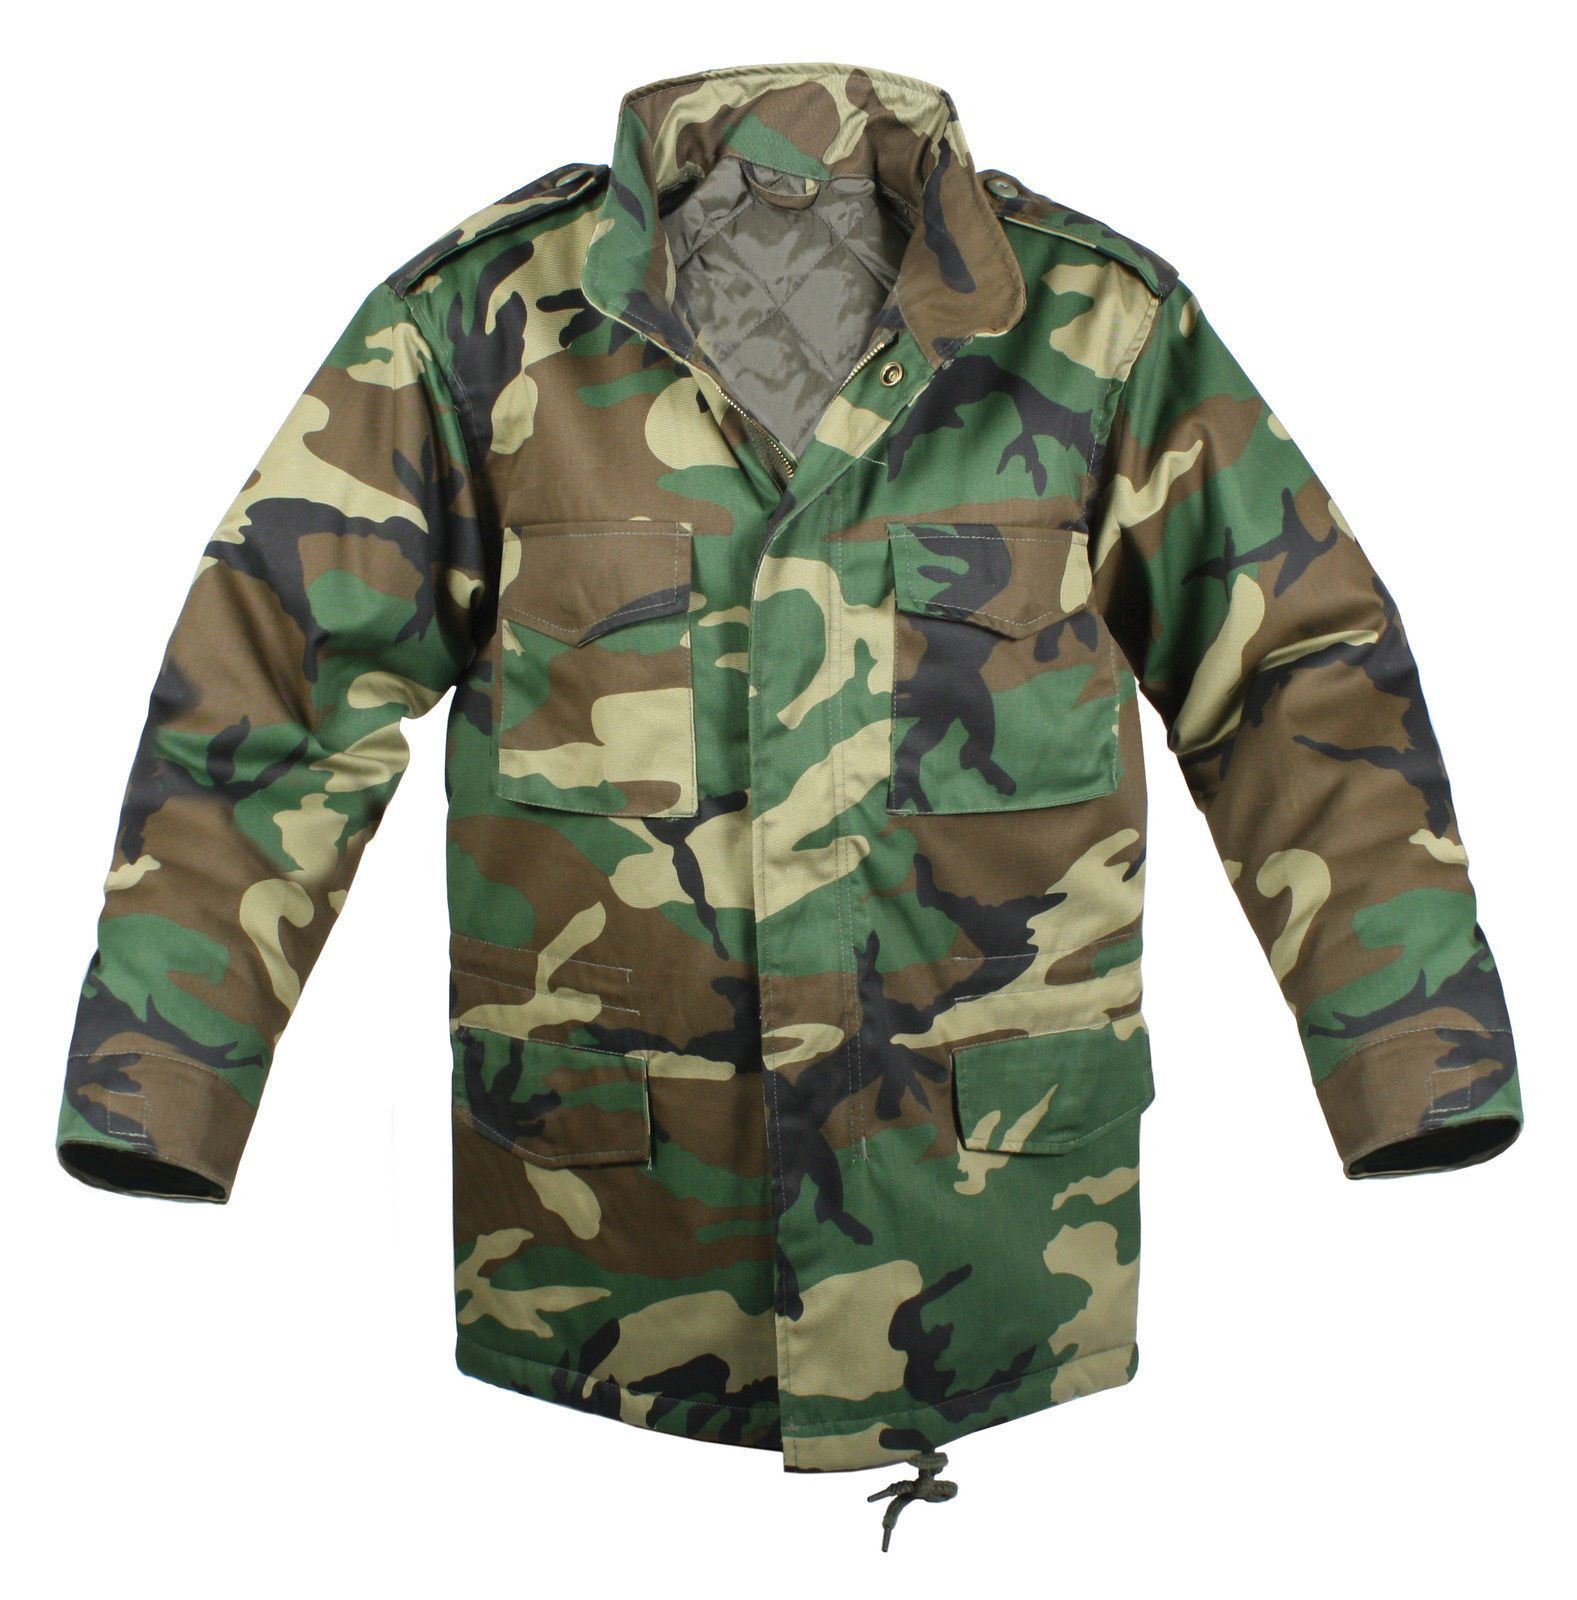 Kids M-65 Field Jacket - Boys Military Jackets - Black Or Wood Camo Winter  Coat 1505a1491bc